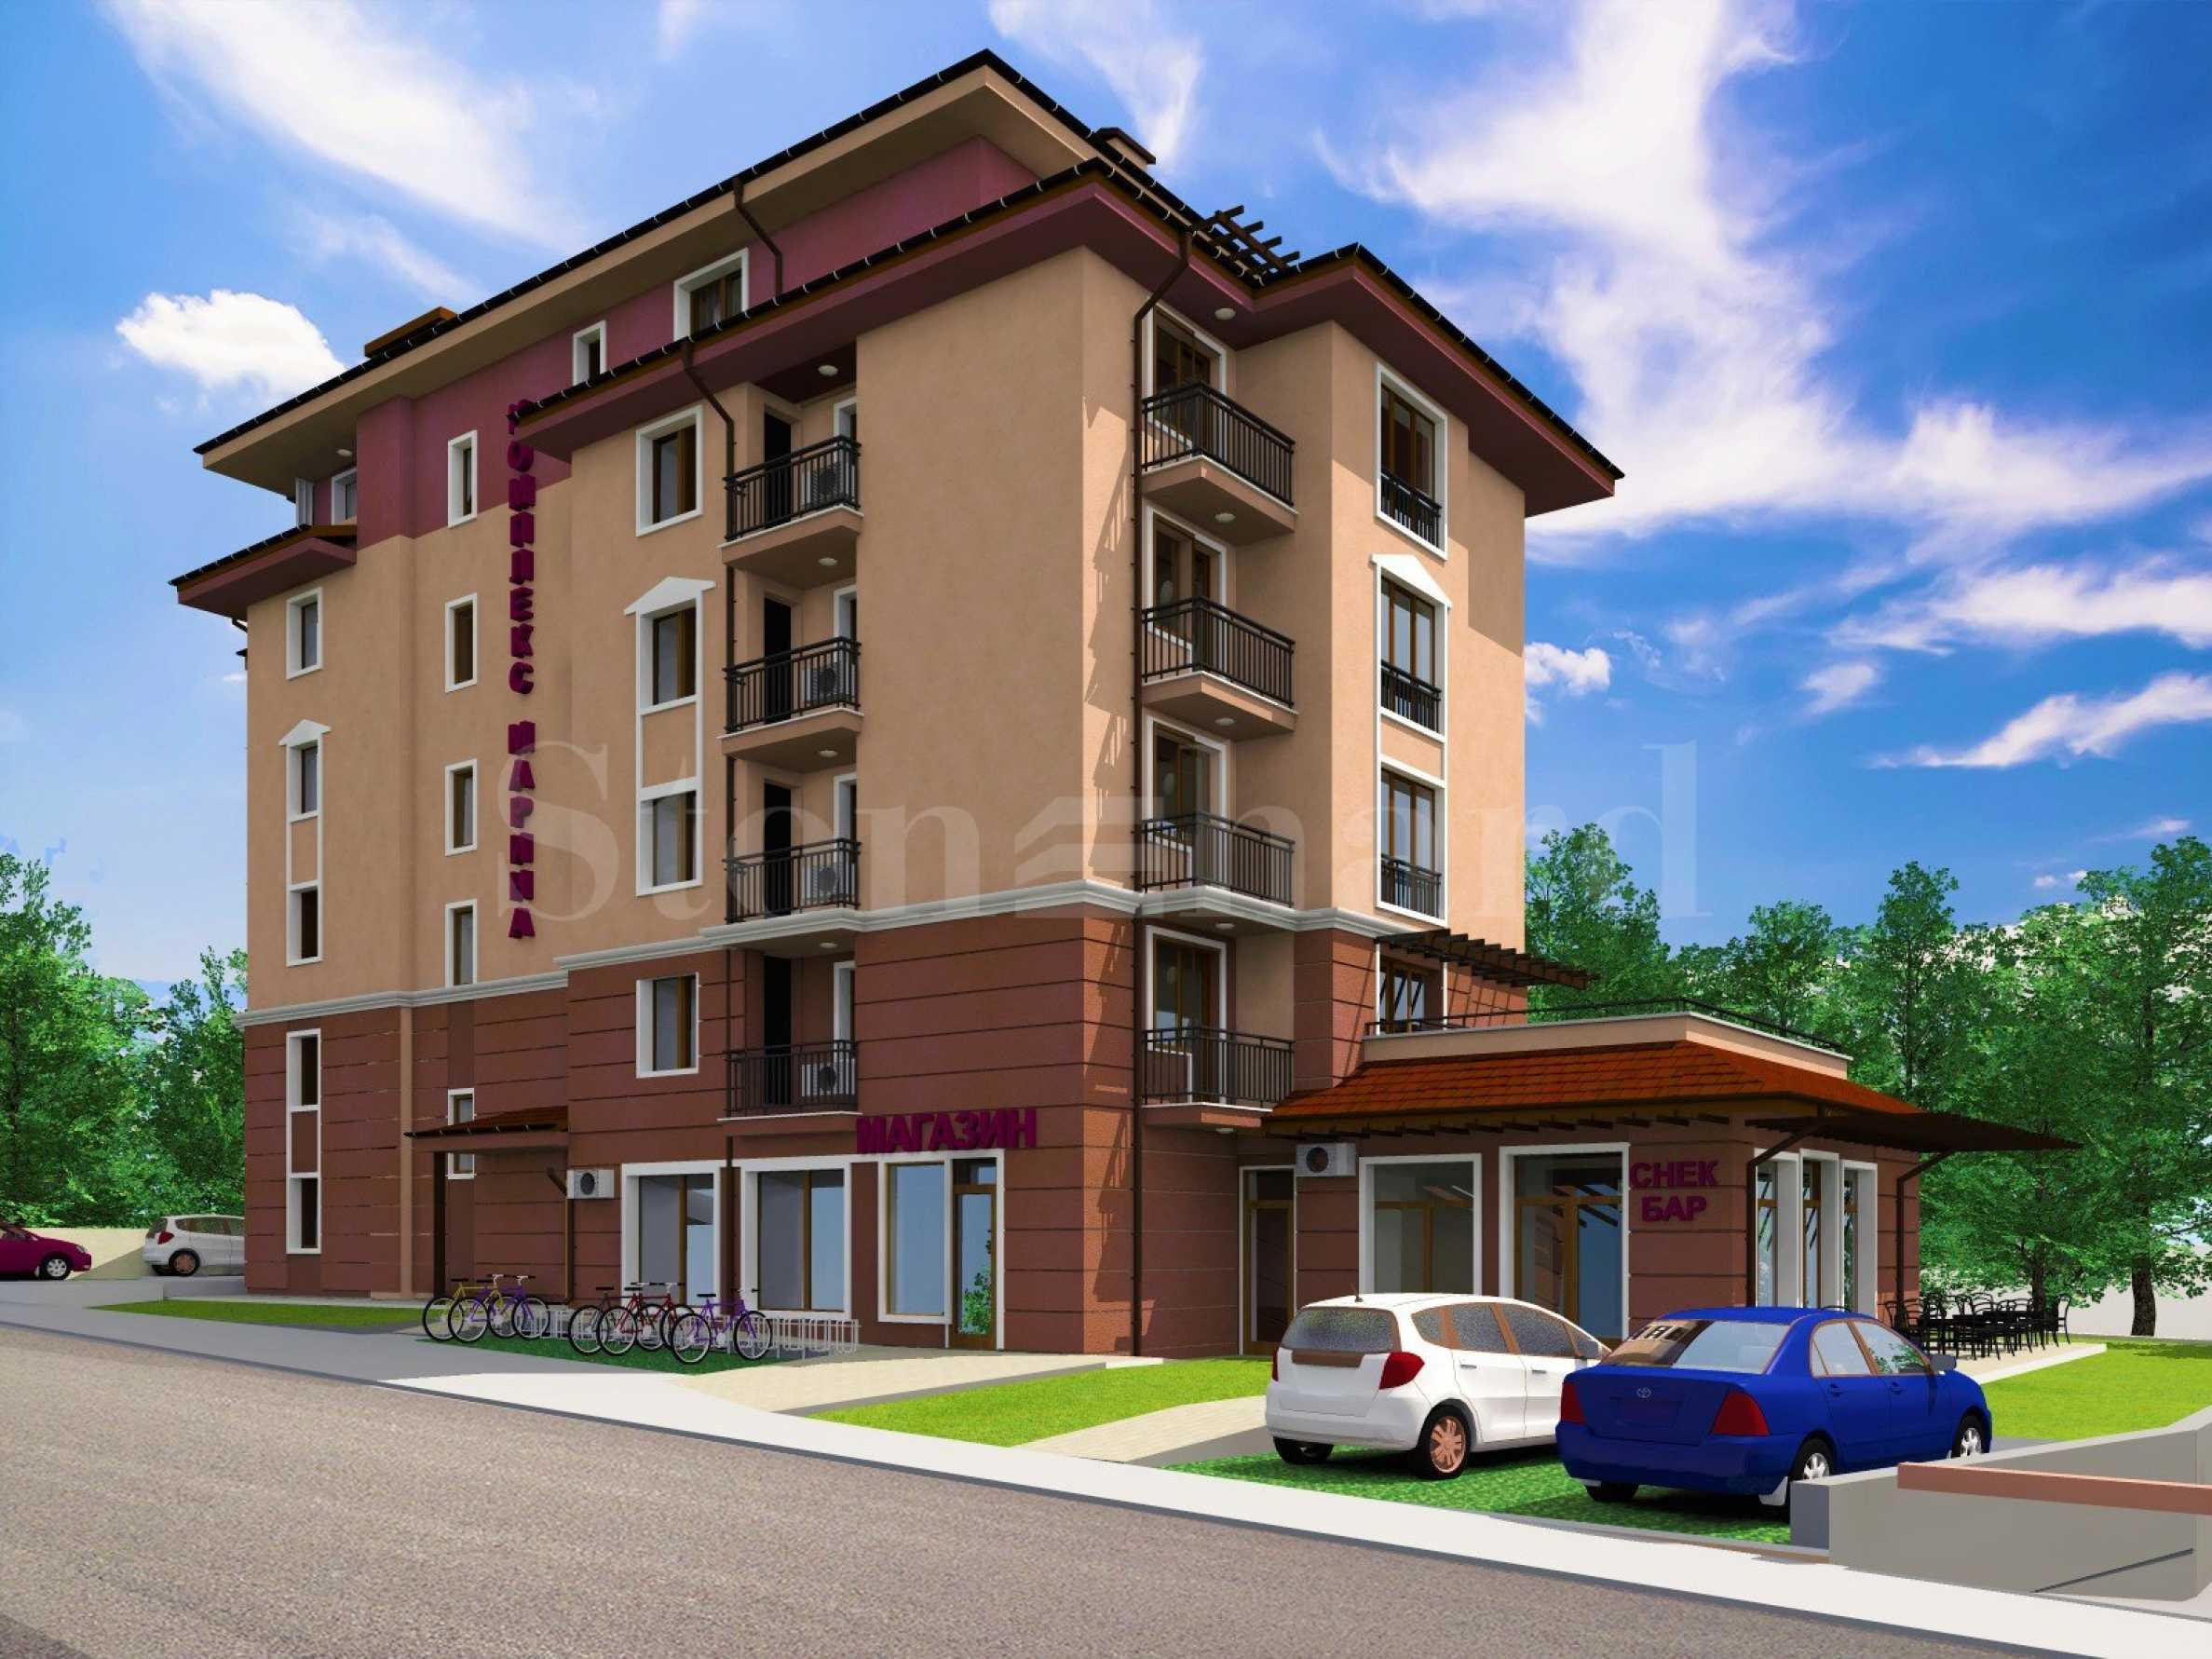 Apartment in St. Constantine and Elena, Varna, Bulgaria2 - Stonehard